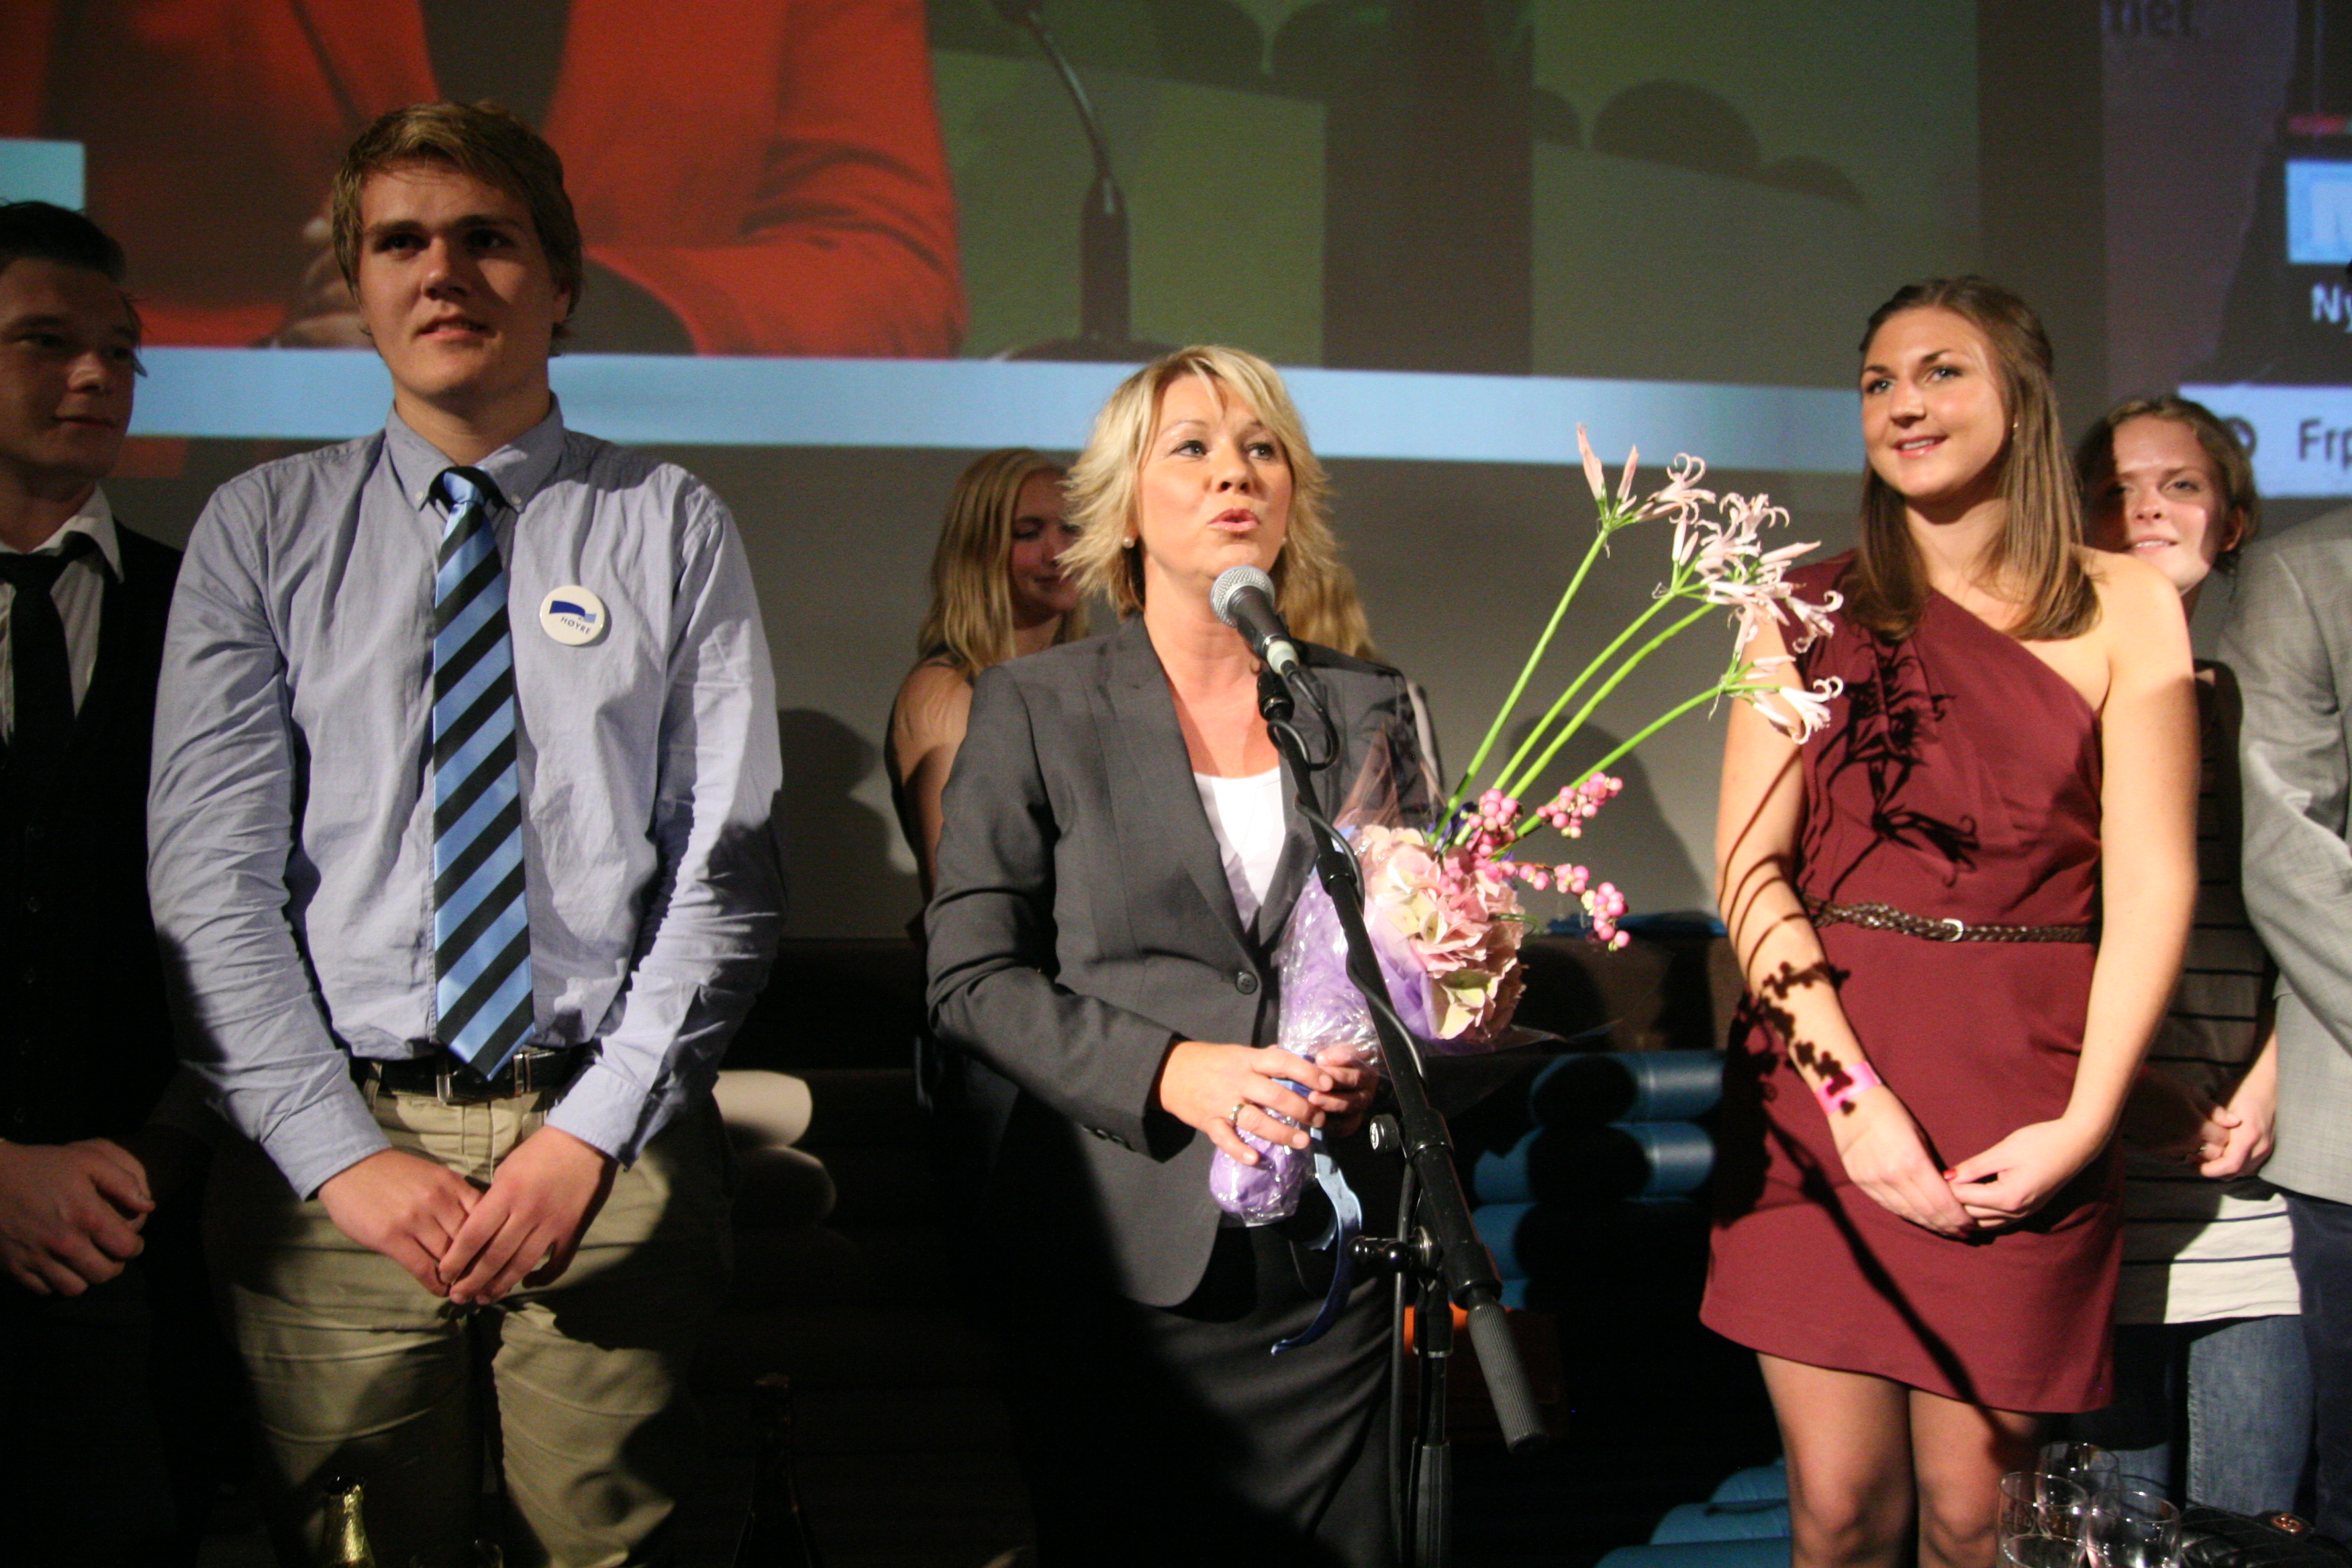 SEIERSTALE: Monica Mæland her plantet med bena i Unge Høyre.